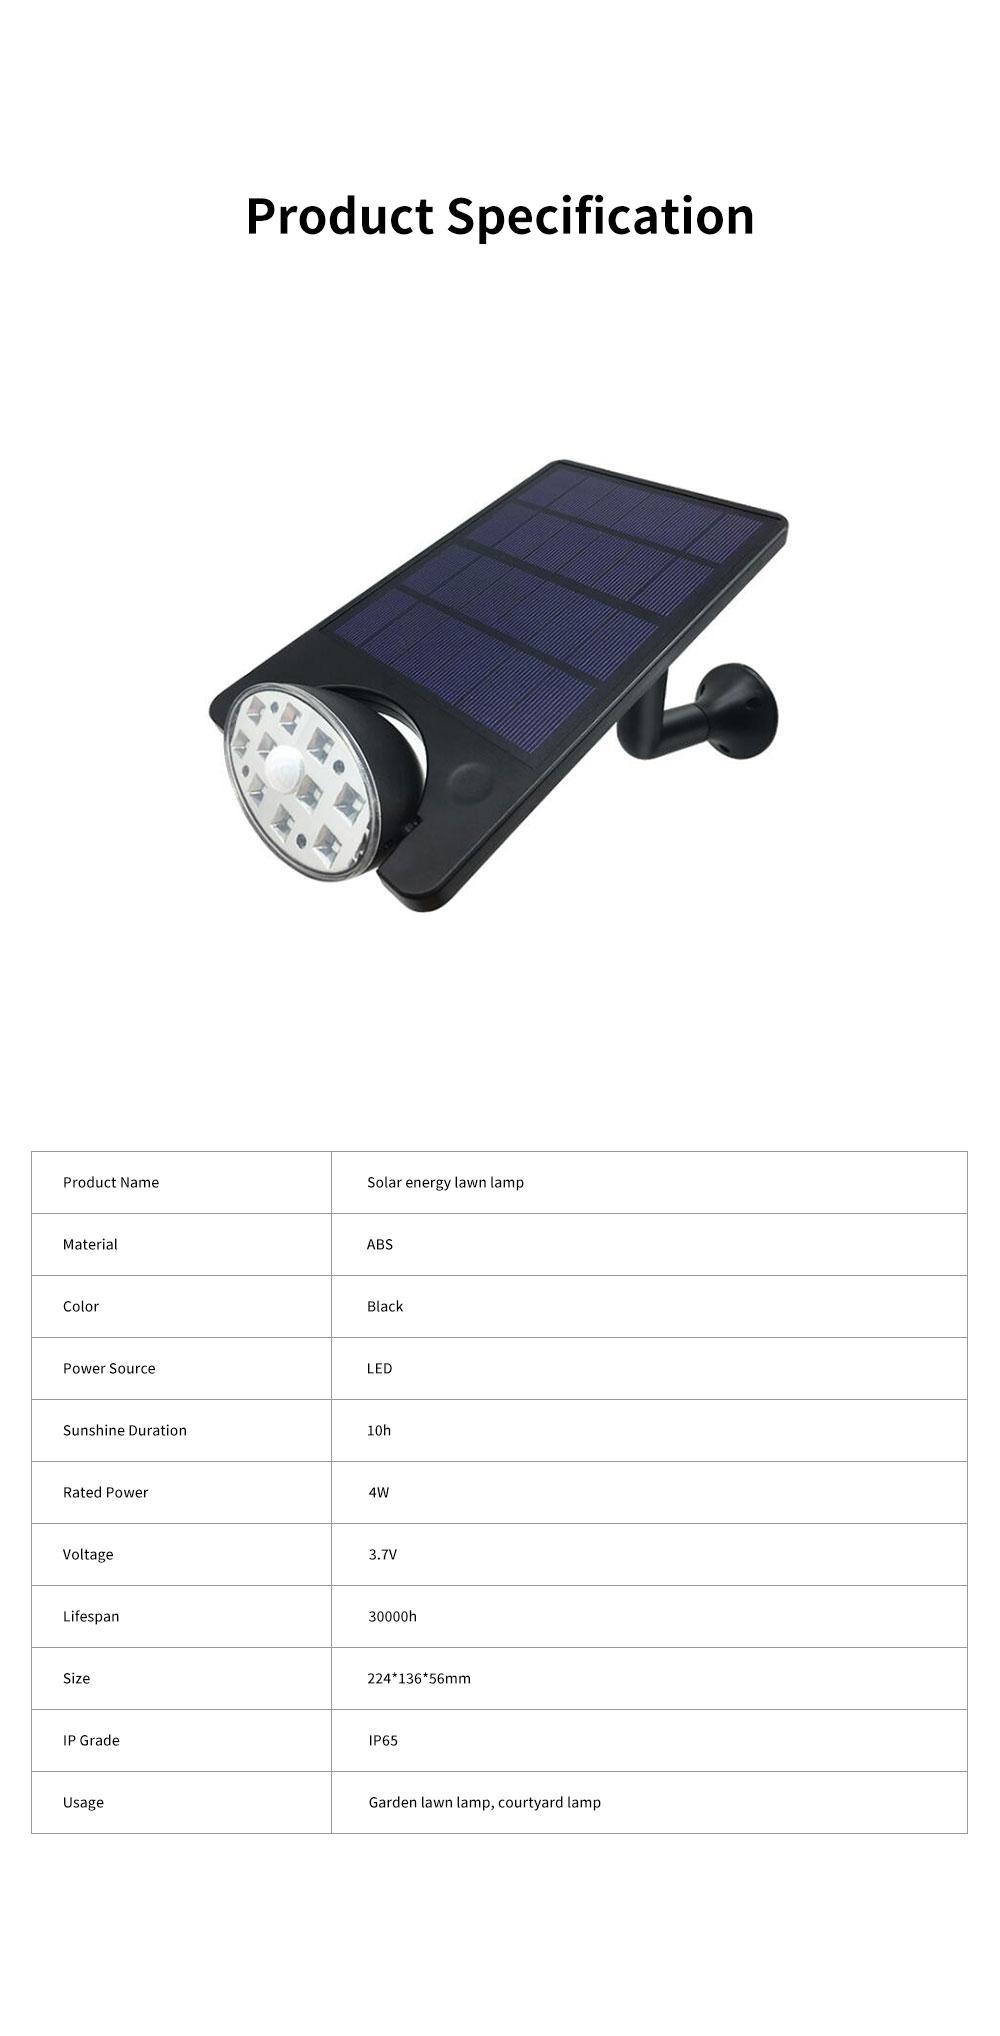 Solar Energy Ultra Thin Wall Lamp for Lawn Lighting Decoration Body Sensing Flat Panel Lawn Light Ultrathin Waterproof Lawn Lamp 8